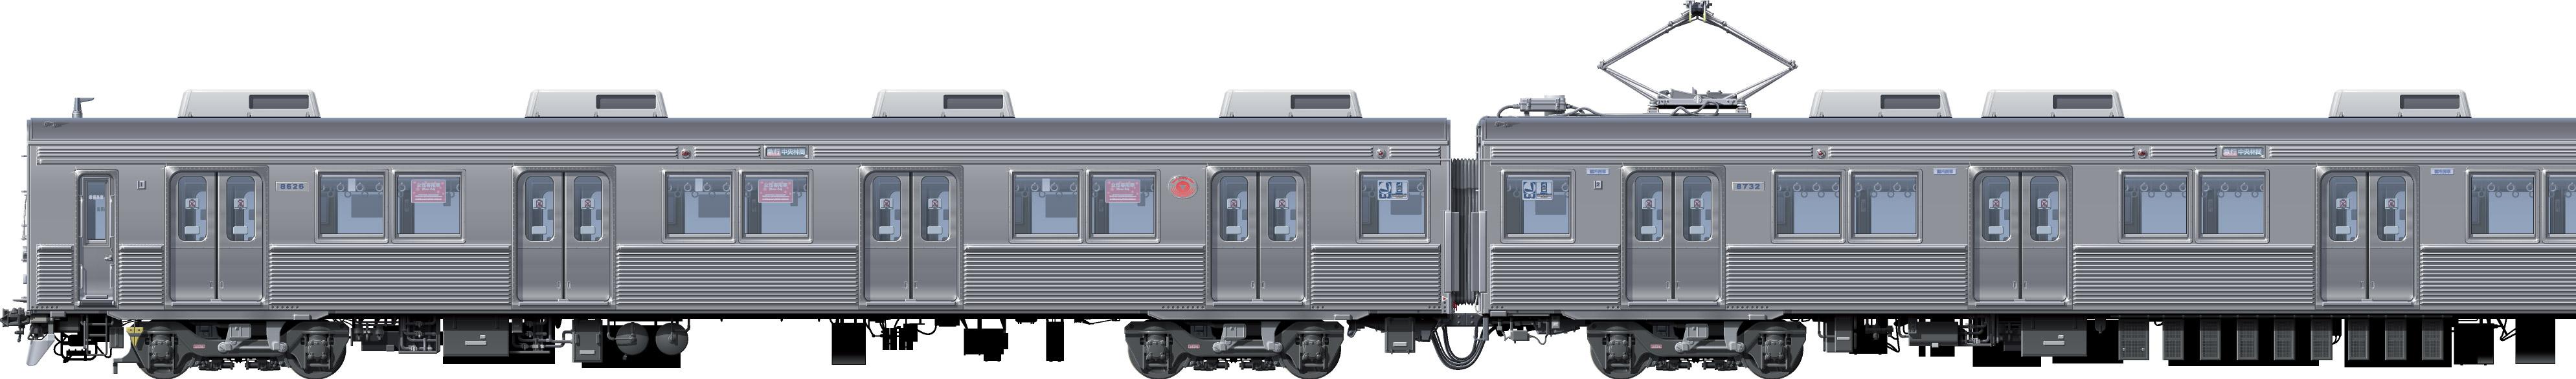 U6771 U6025 8500 U7cfb  U30b5 U30a4 U30c9 U30d3 U30e5 U30fc U30a4 U30e9 U30b9 U30c8